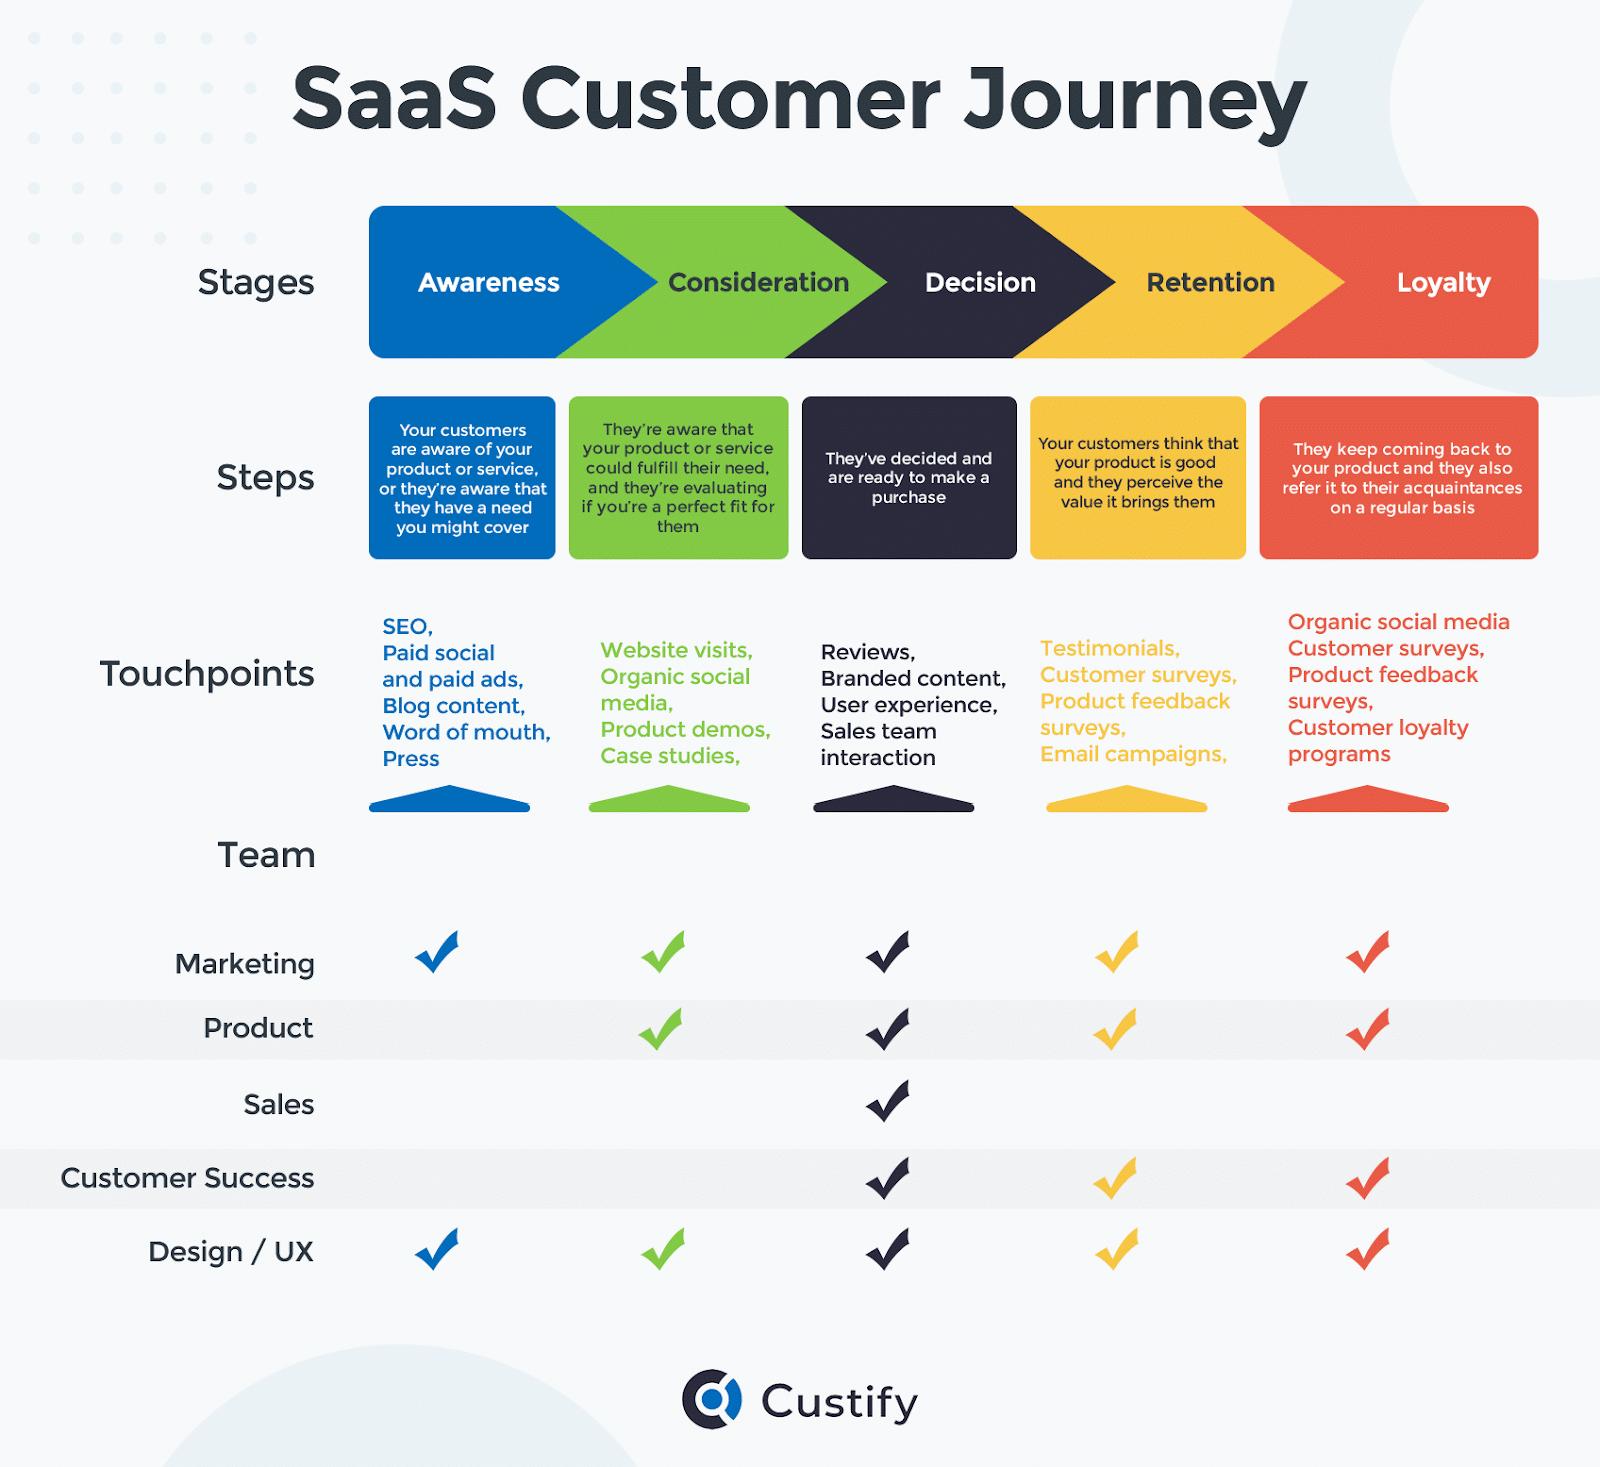 saas-customer-journey